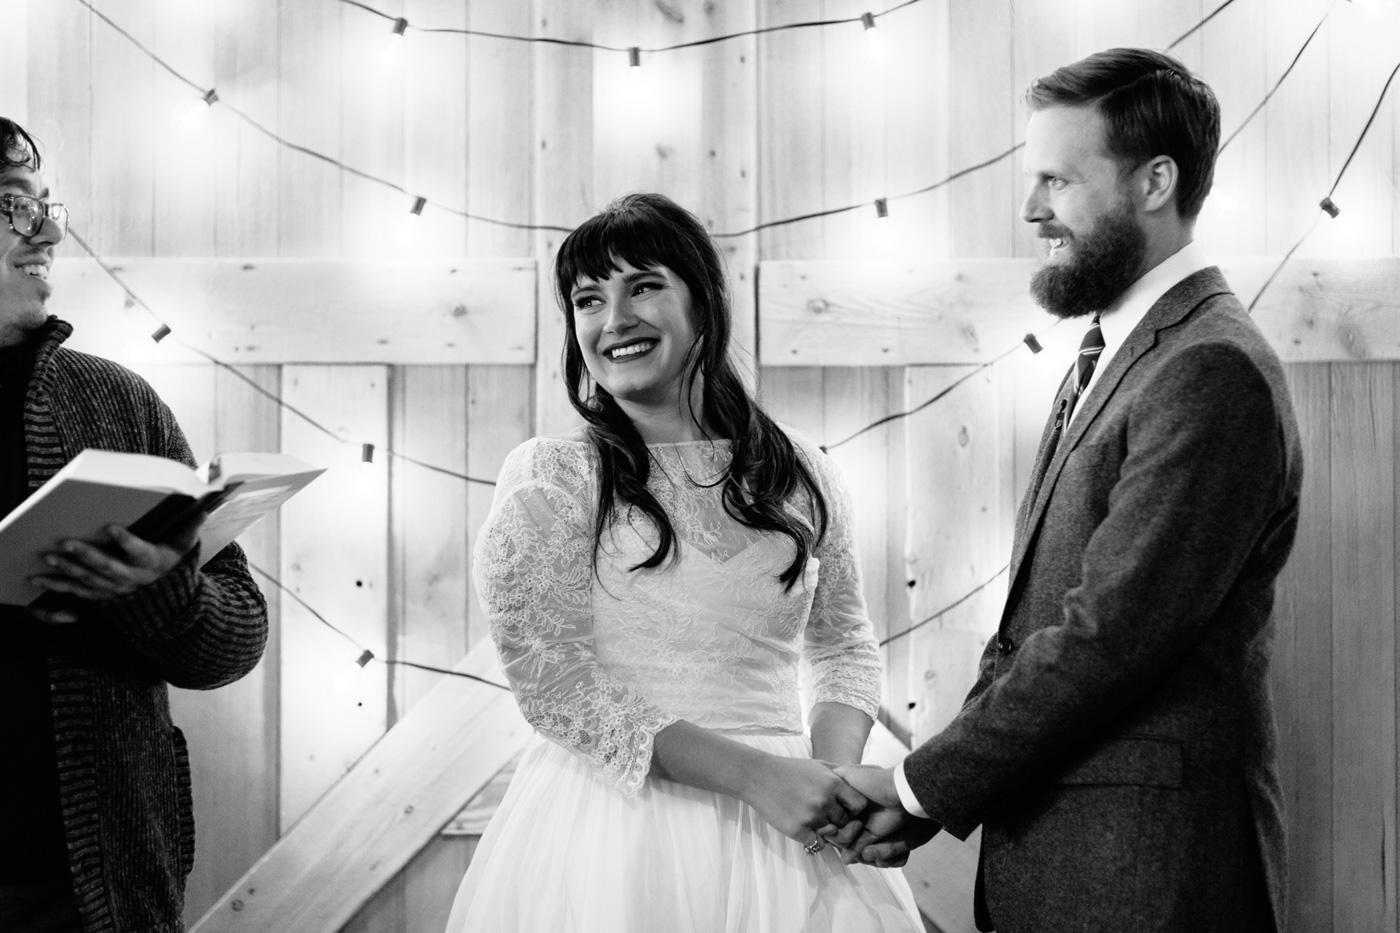 Studios-at-Overland-Crossing-Wedding-Photographer-00035.jpg